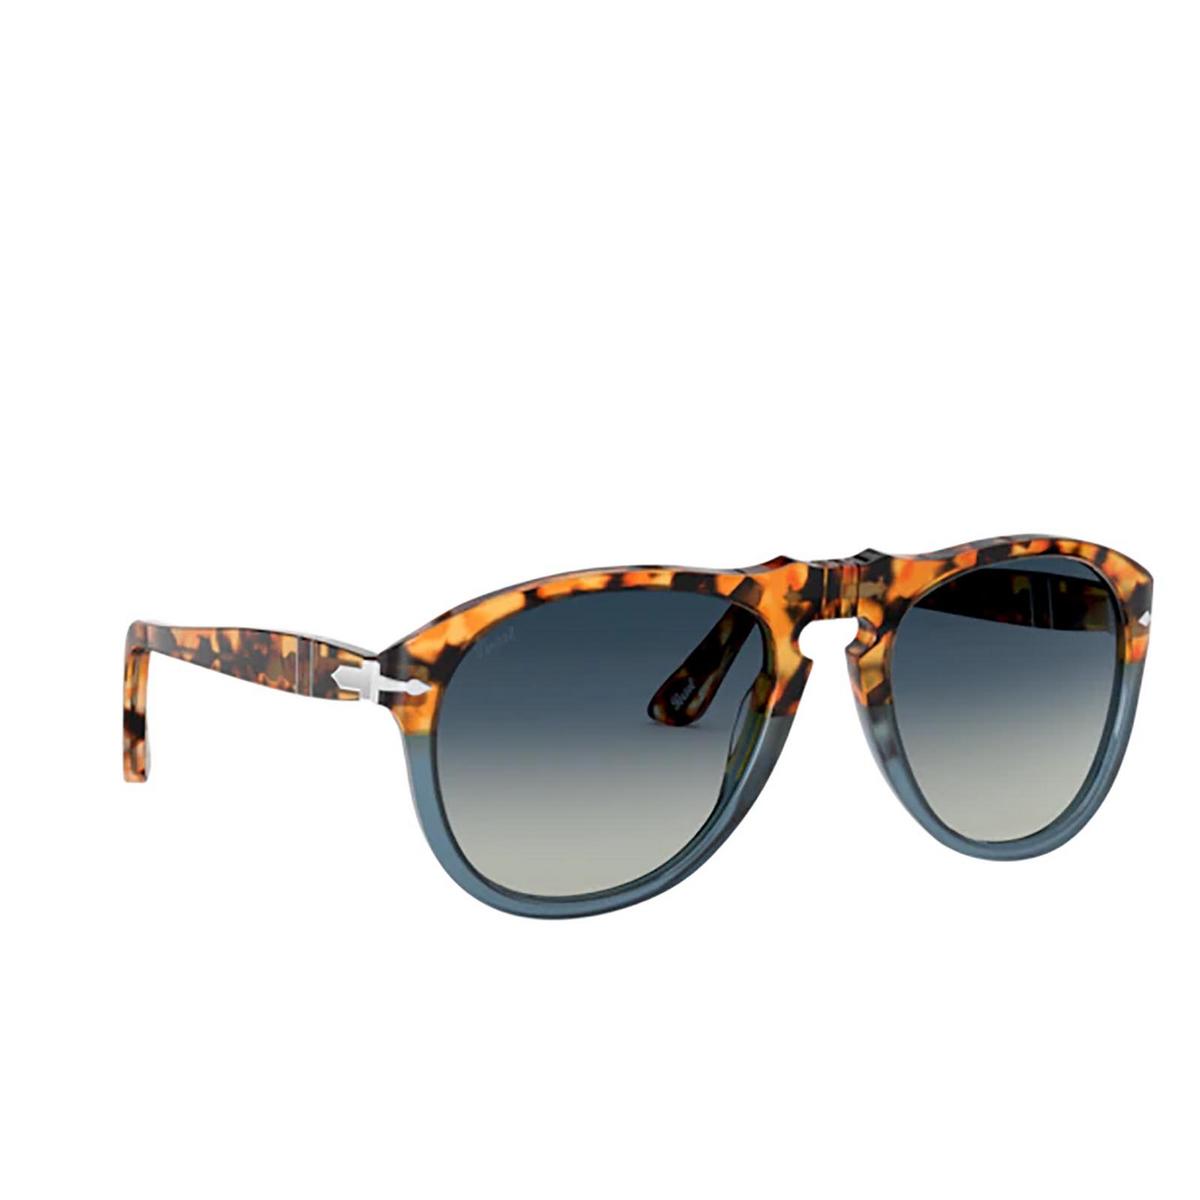 Persol® Aviator Sunglasses: PO0649 color Brown Tortoise & Opal Blue 112032 - three-quarters view.